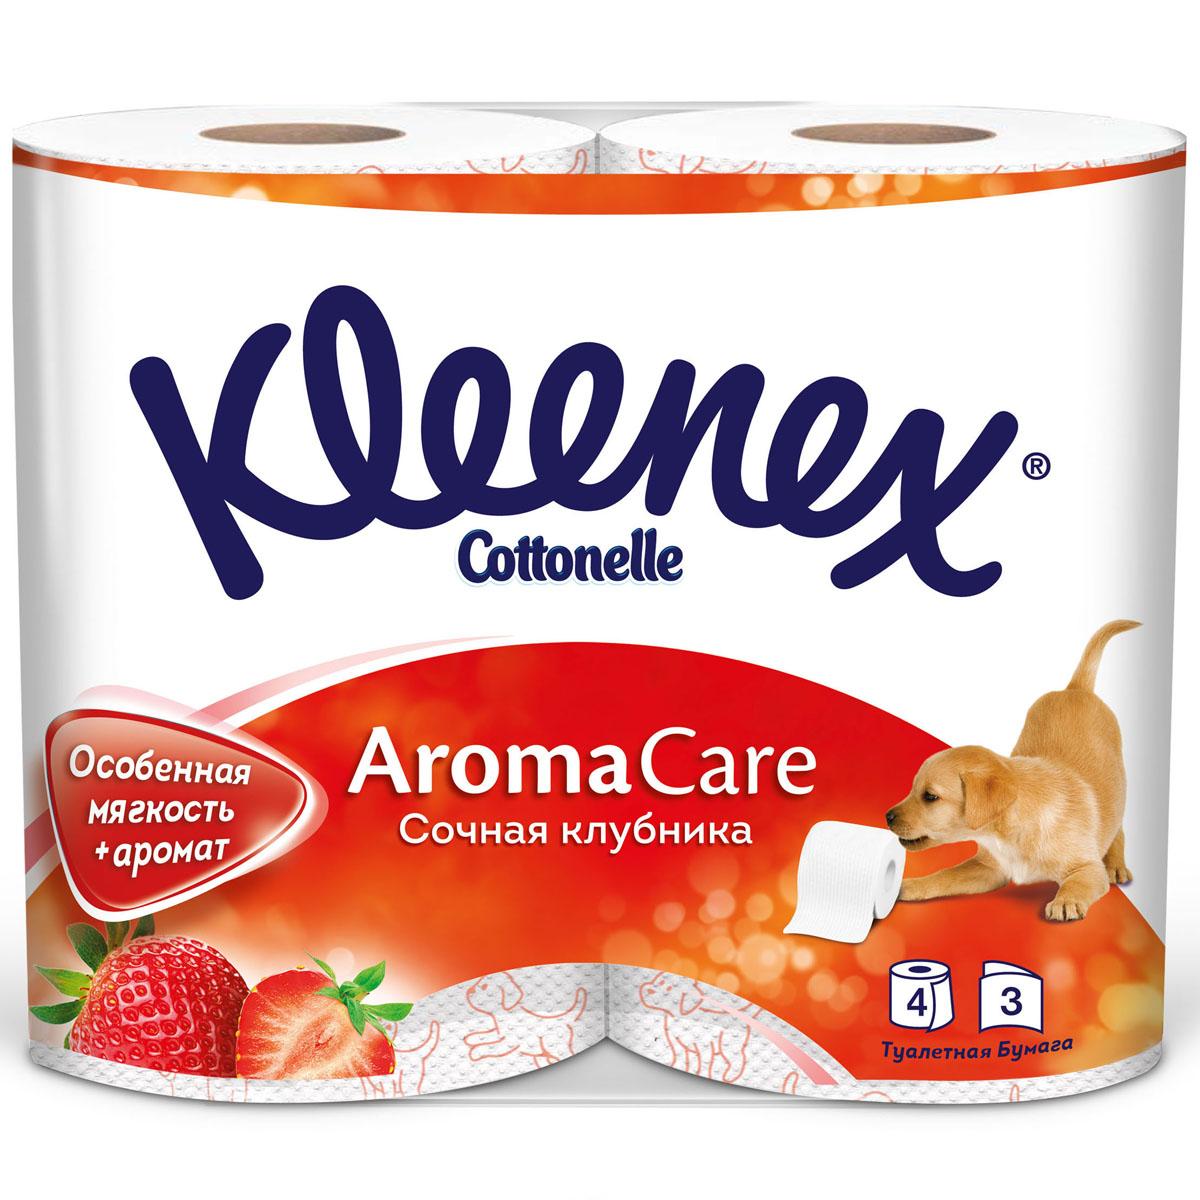 Туалетная бумага Kleenex сочная клубника (3 слоя) 4 шт<br>